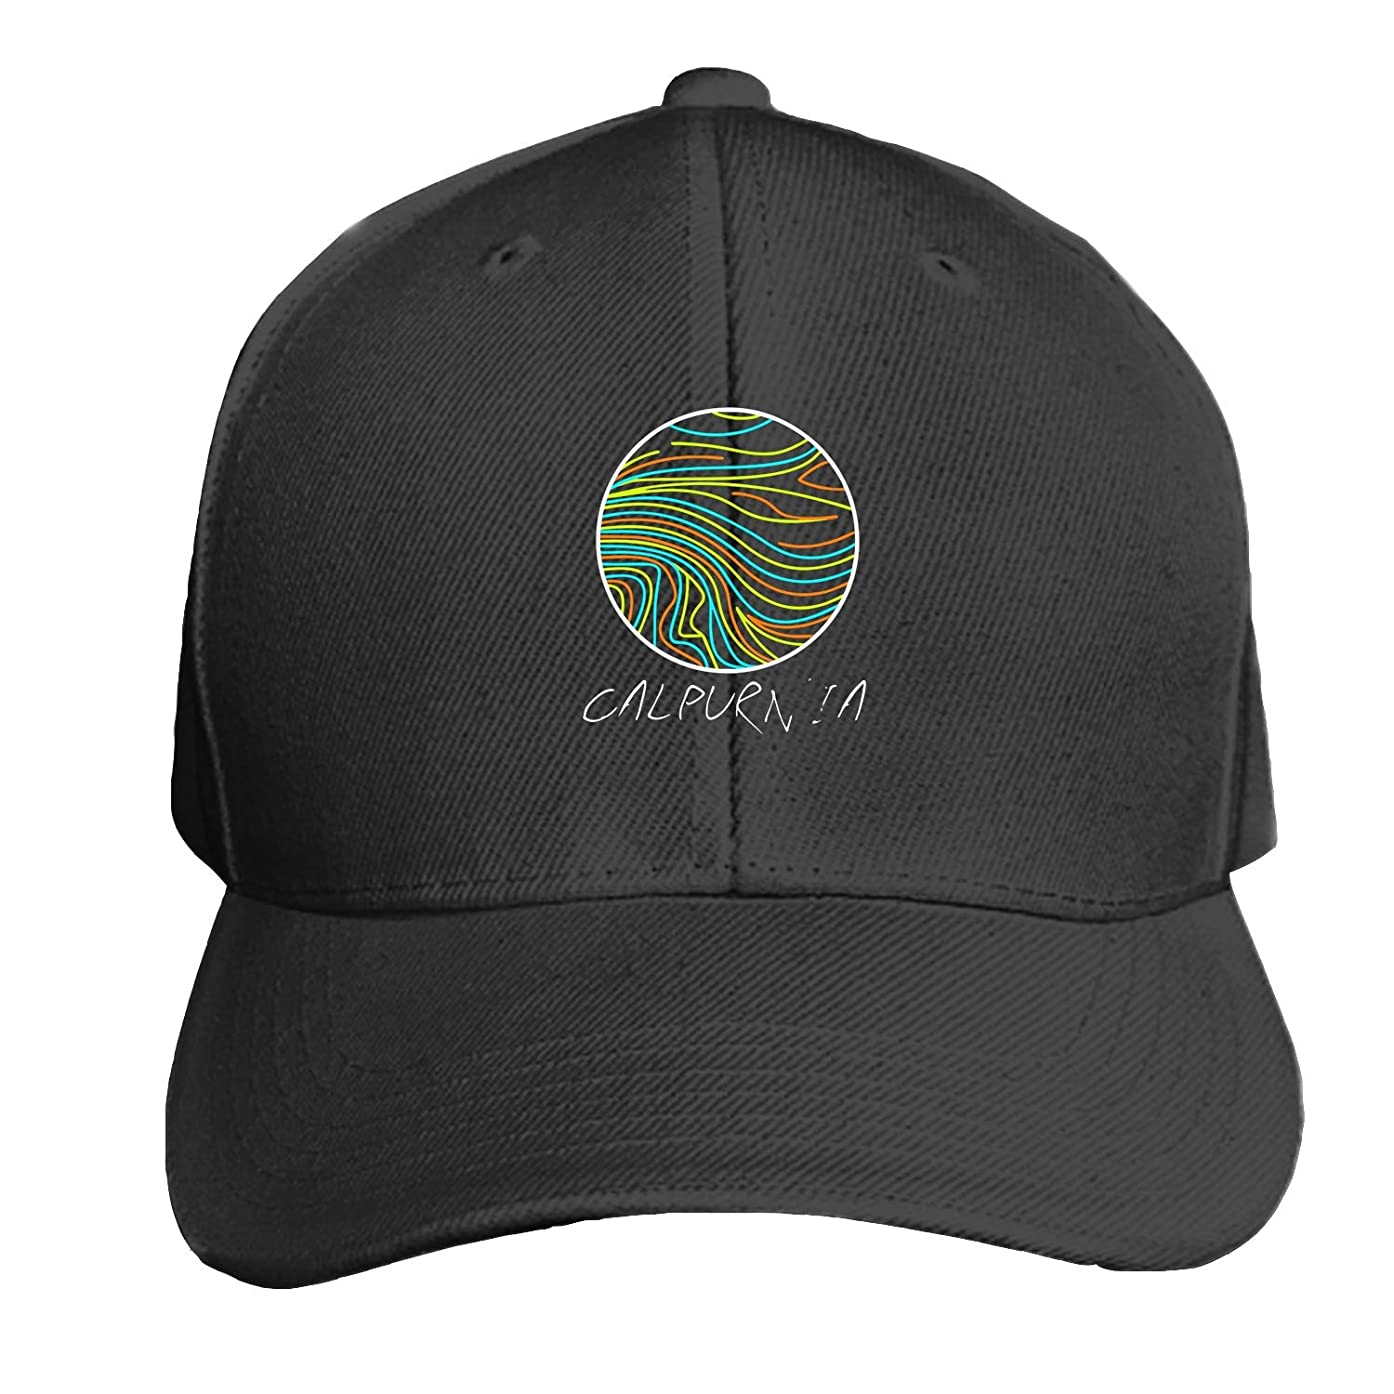 iloue Baseball Caps, Women Men Unisex Bowl A Saurus Rex Snapback Hats Baseball Caps